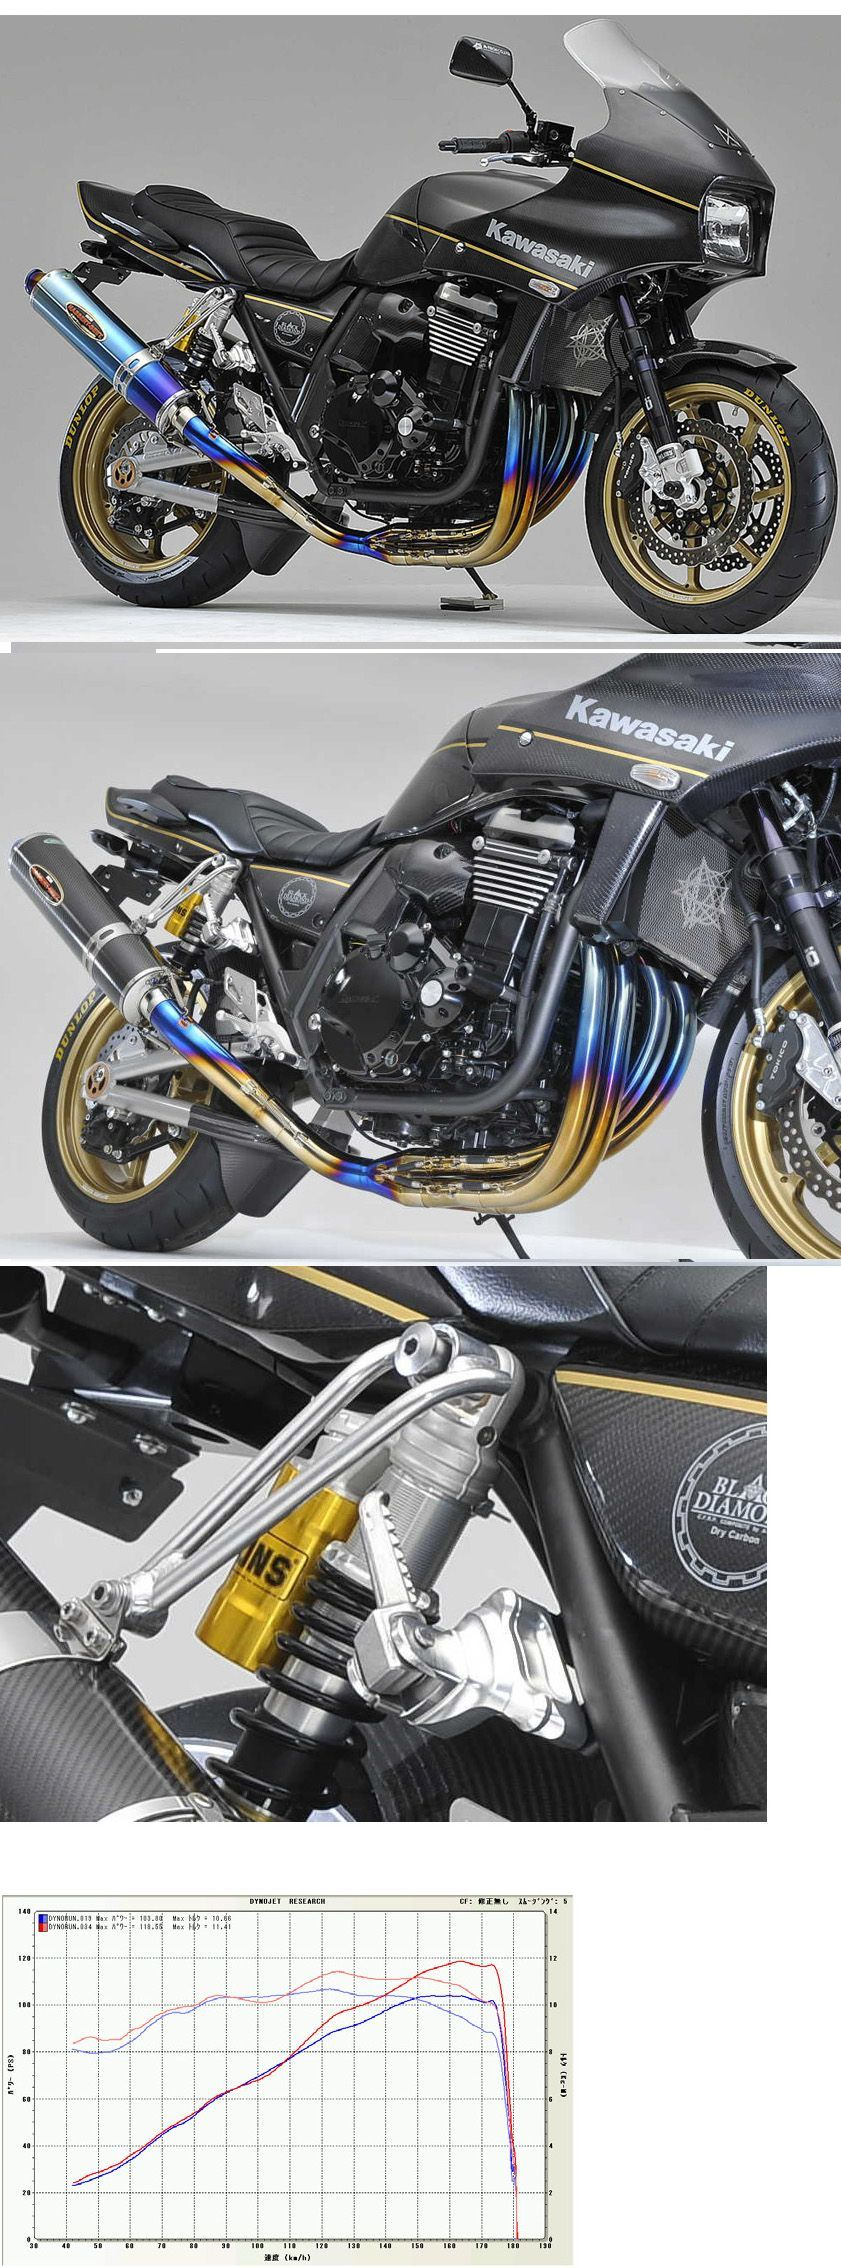 【BEET】NASSERT-3D 全段排氣管 - 「Webike-摩托百貨」